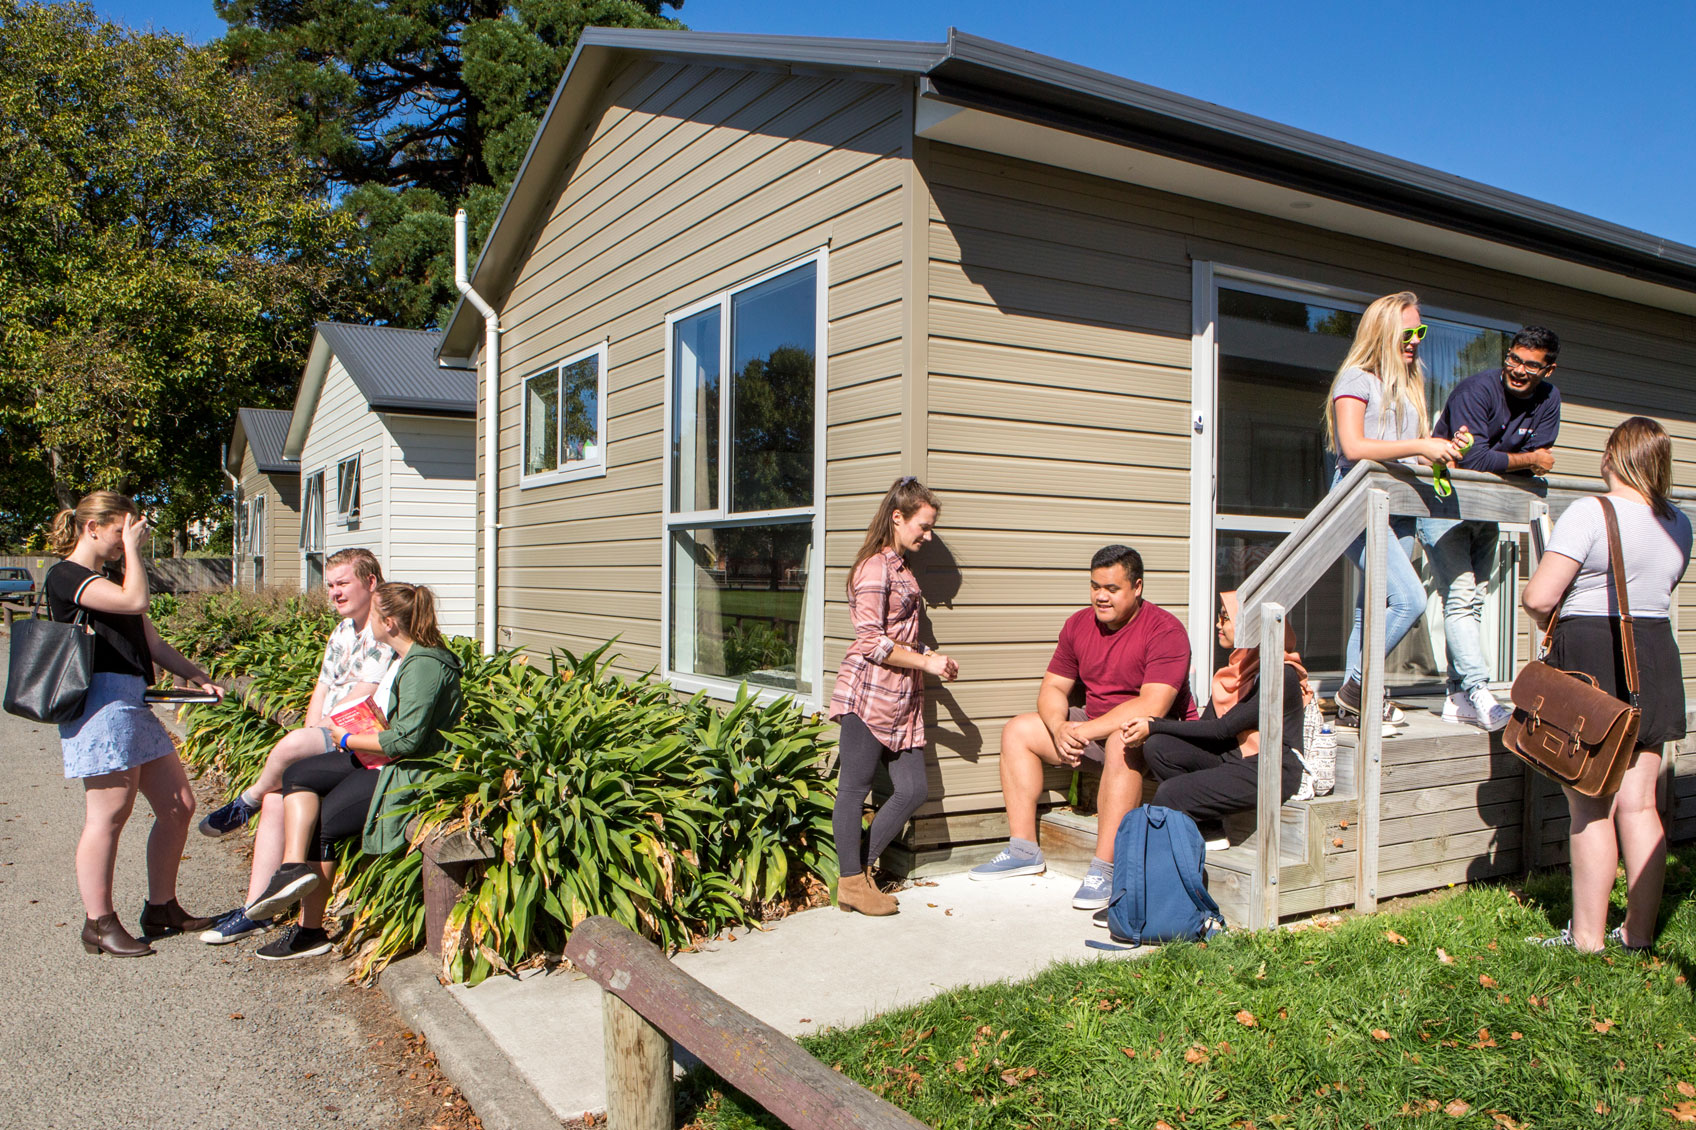 waimairi village students talking outside